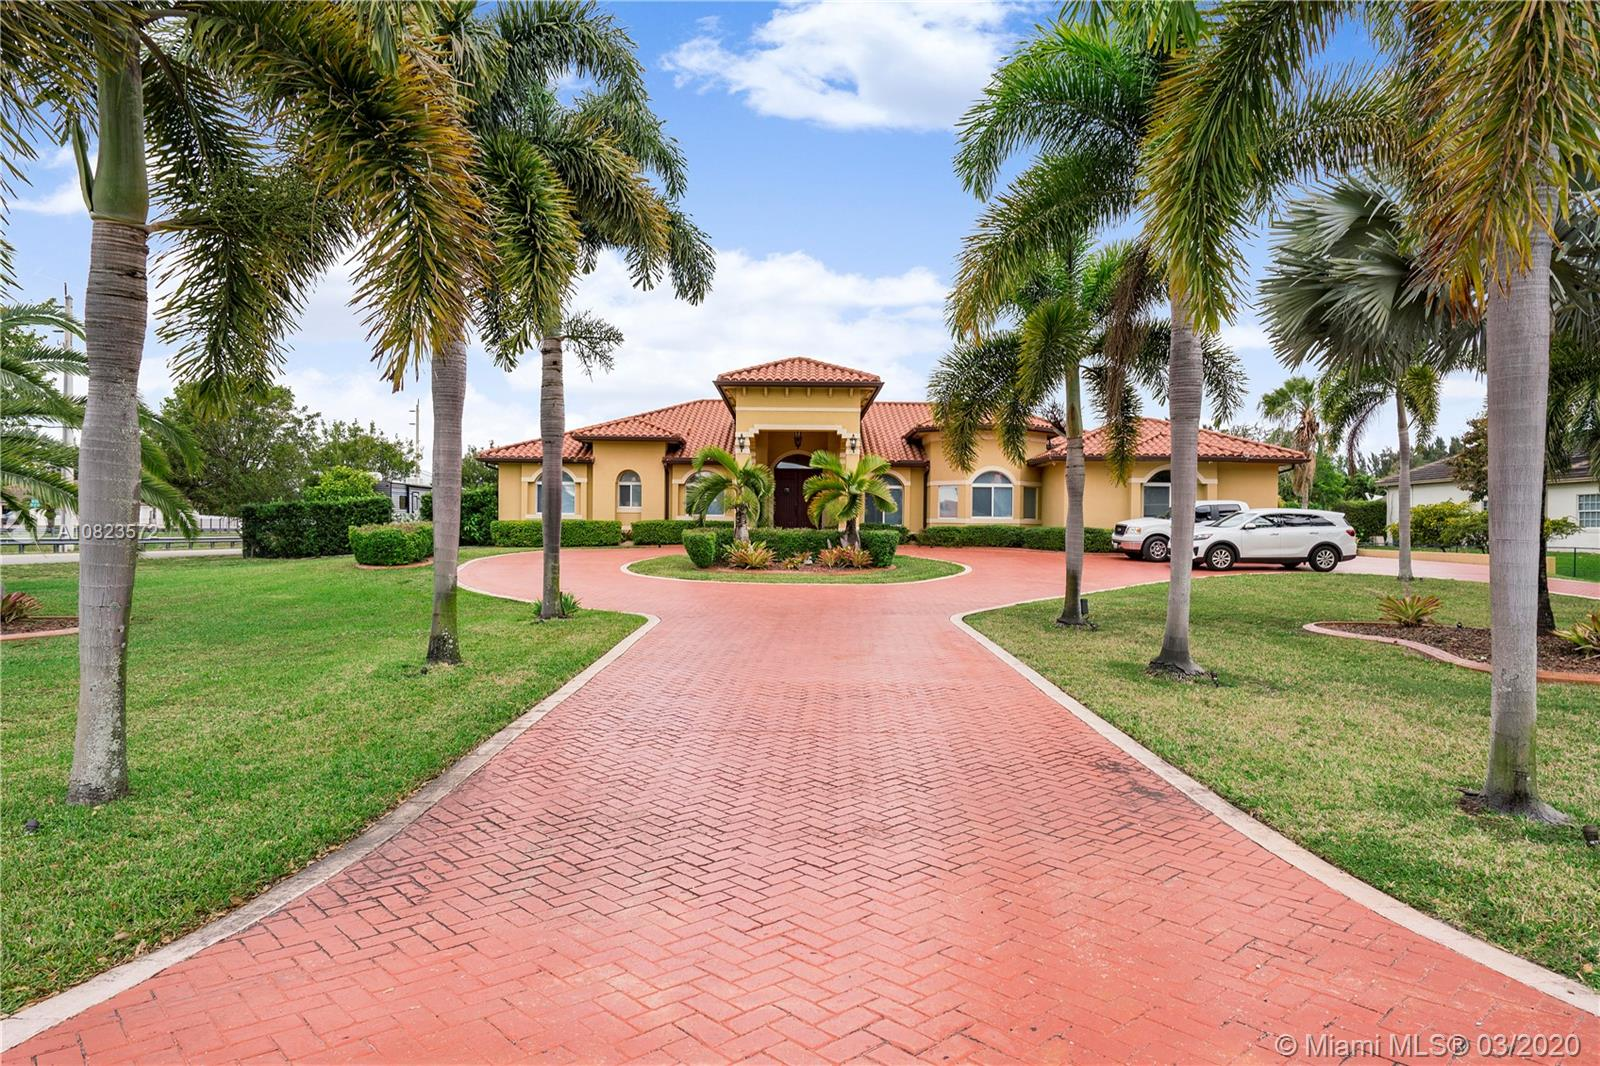 4080 SW 141st Ave, Miramar, FL 33027 - Miramar, FL real estate listing